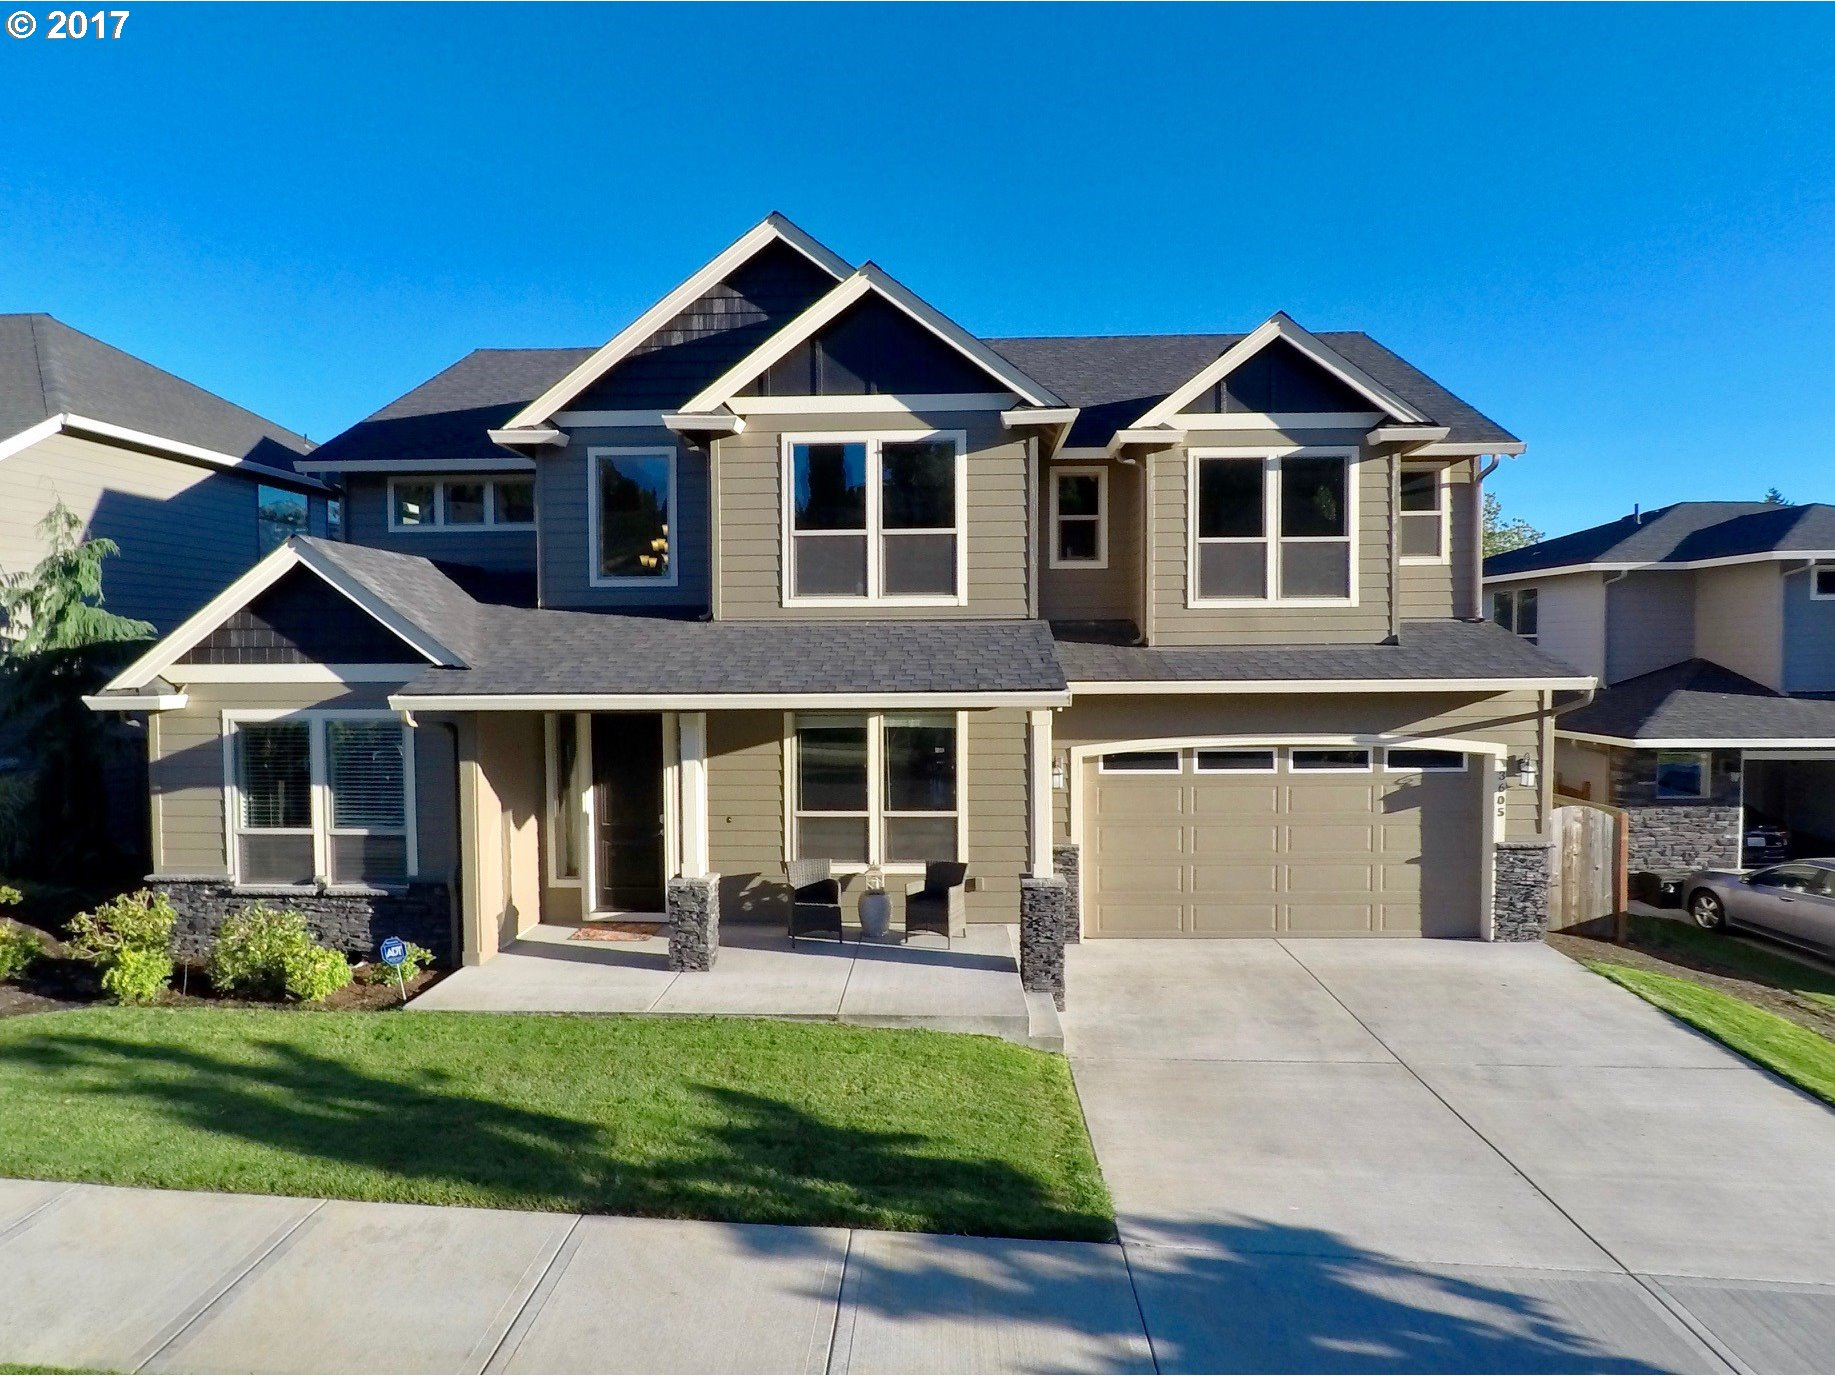 3605 SE 142ND CT, Vancouver, WA 98683